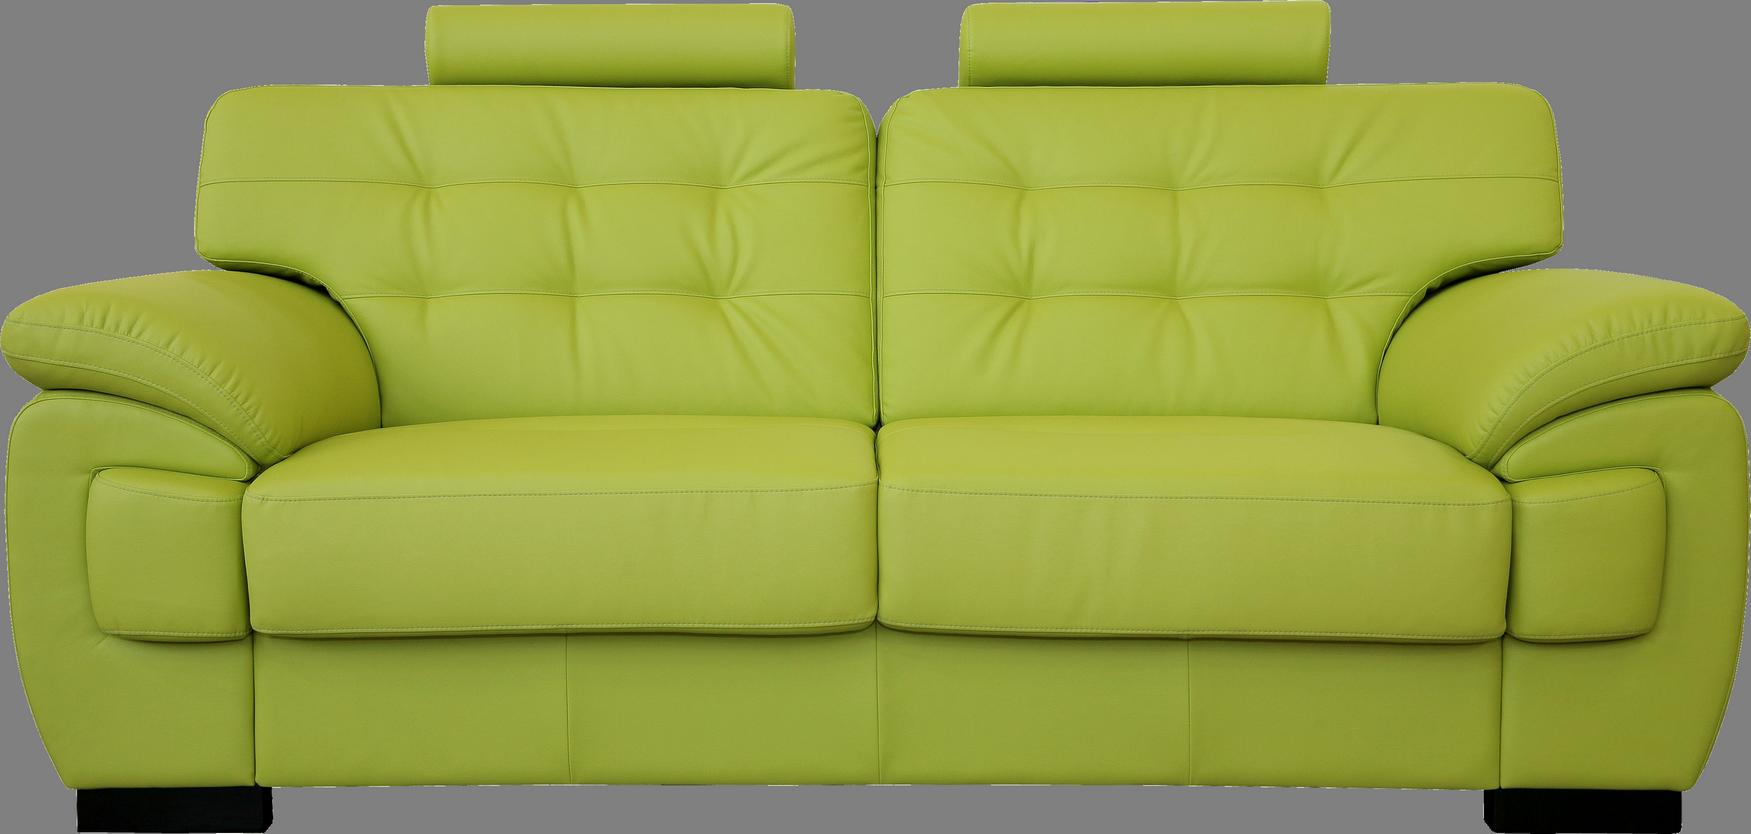 Sofa PNG Image